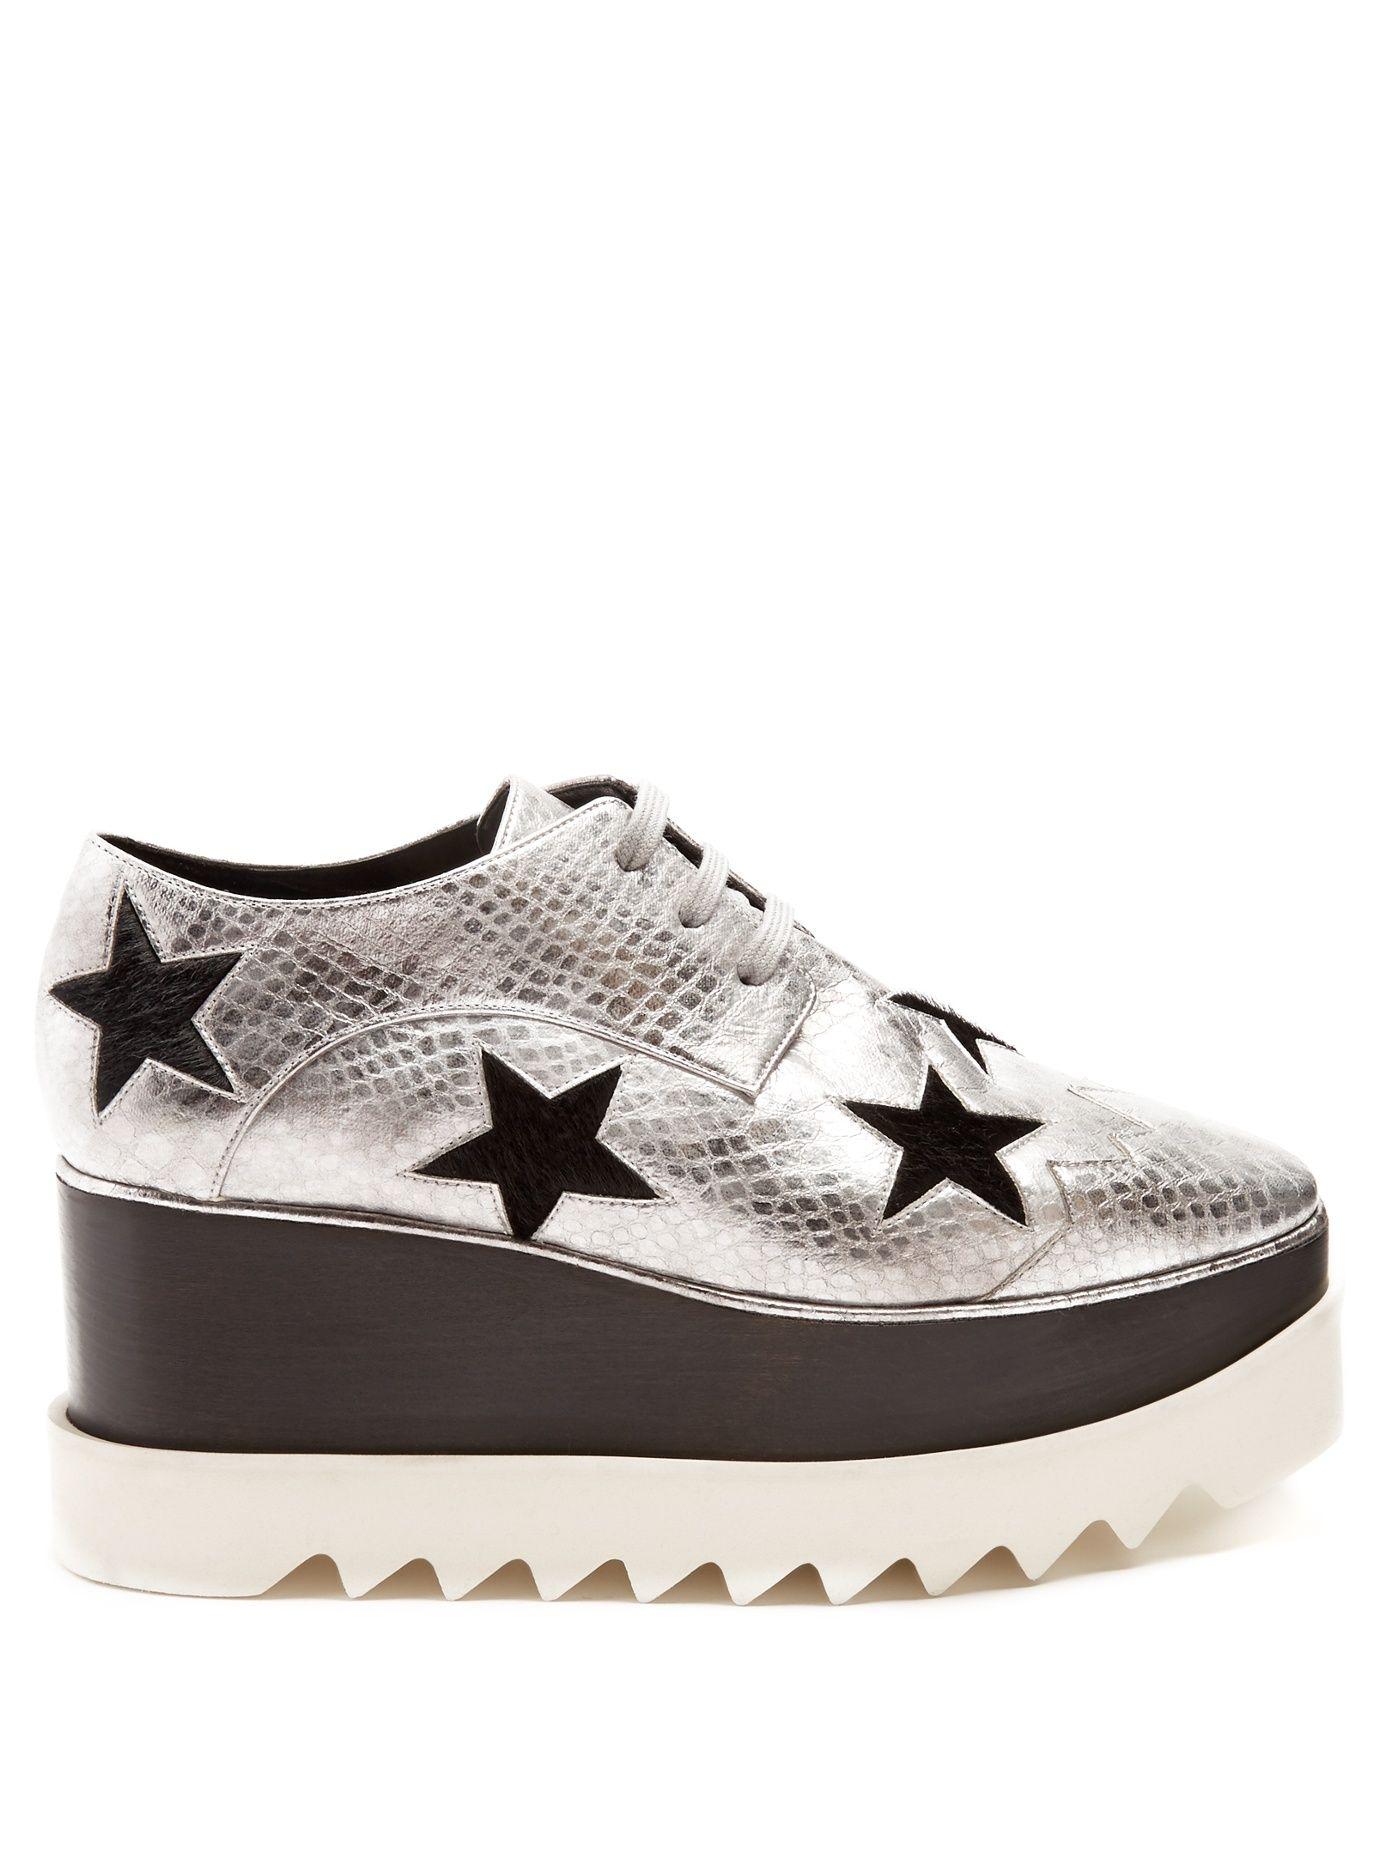 2e9568734549 Click here to buy Stella McCartney Elyse lace-up platform shoes at  MATCHESFASHION.COM